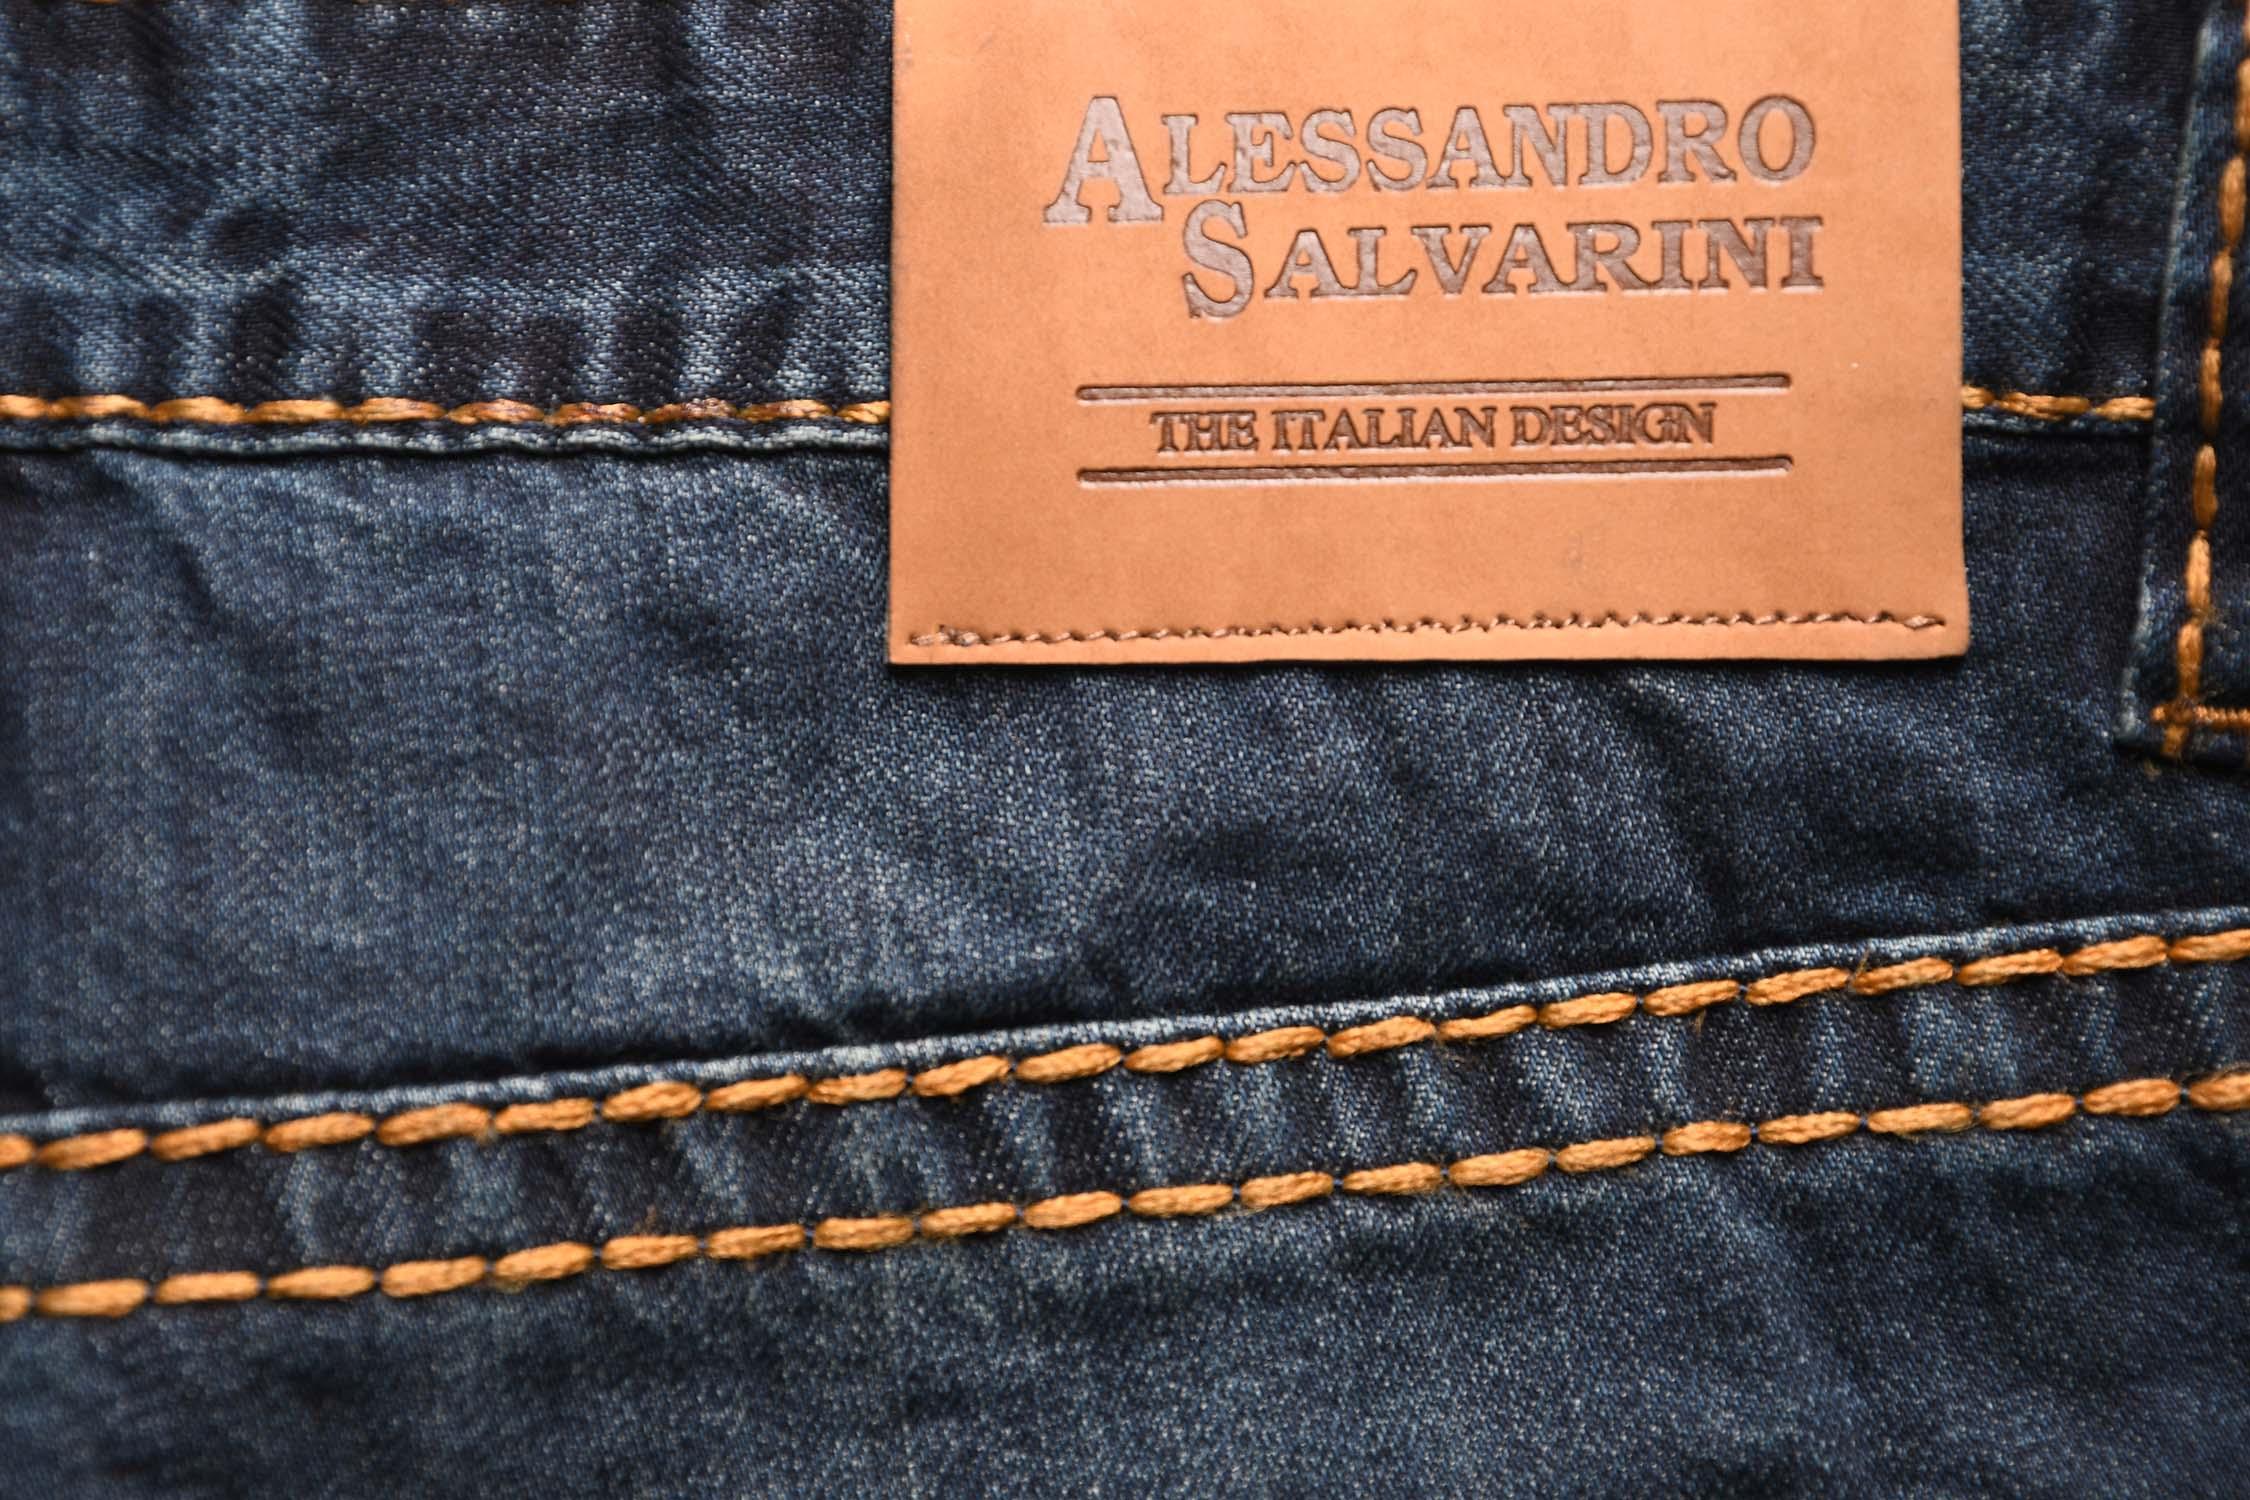 A-Salvarini-Herren-Jeans-Hose-dicke-Naehte-Jeanshose-Comfort-Fit-gerades-Bein Indexbild 9